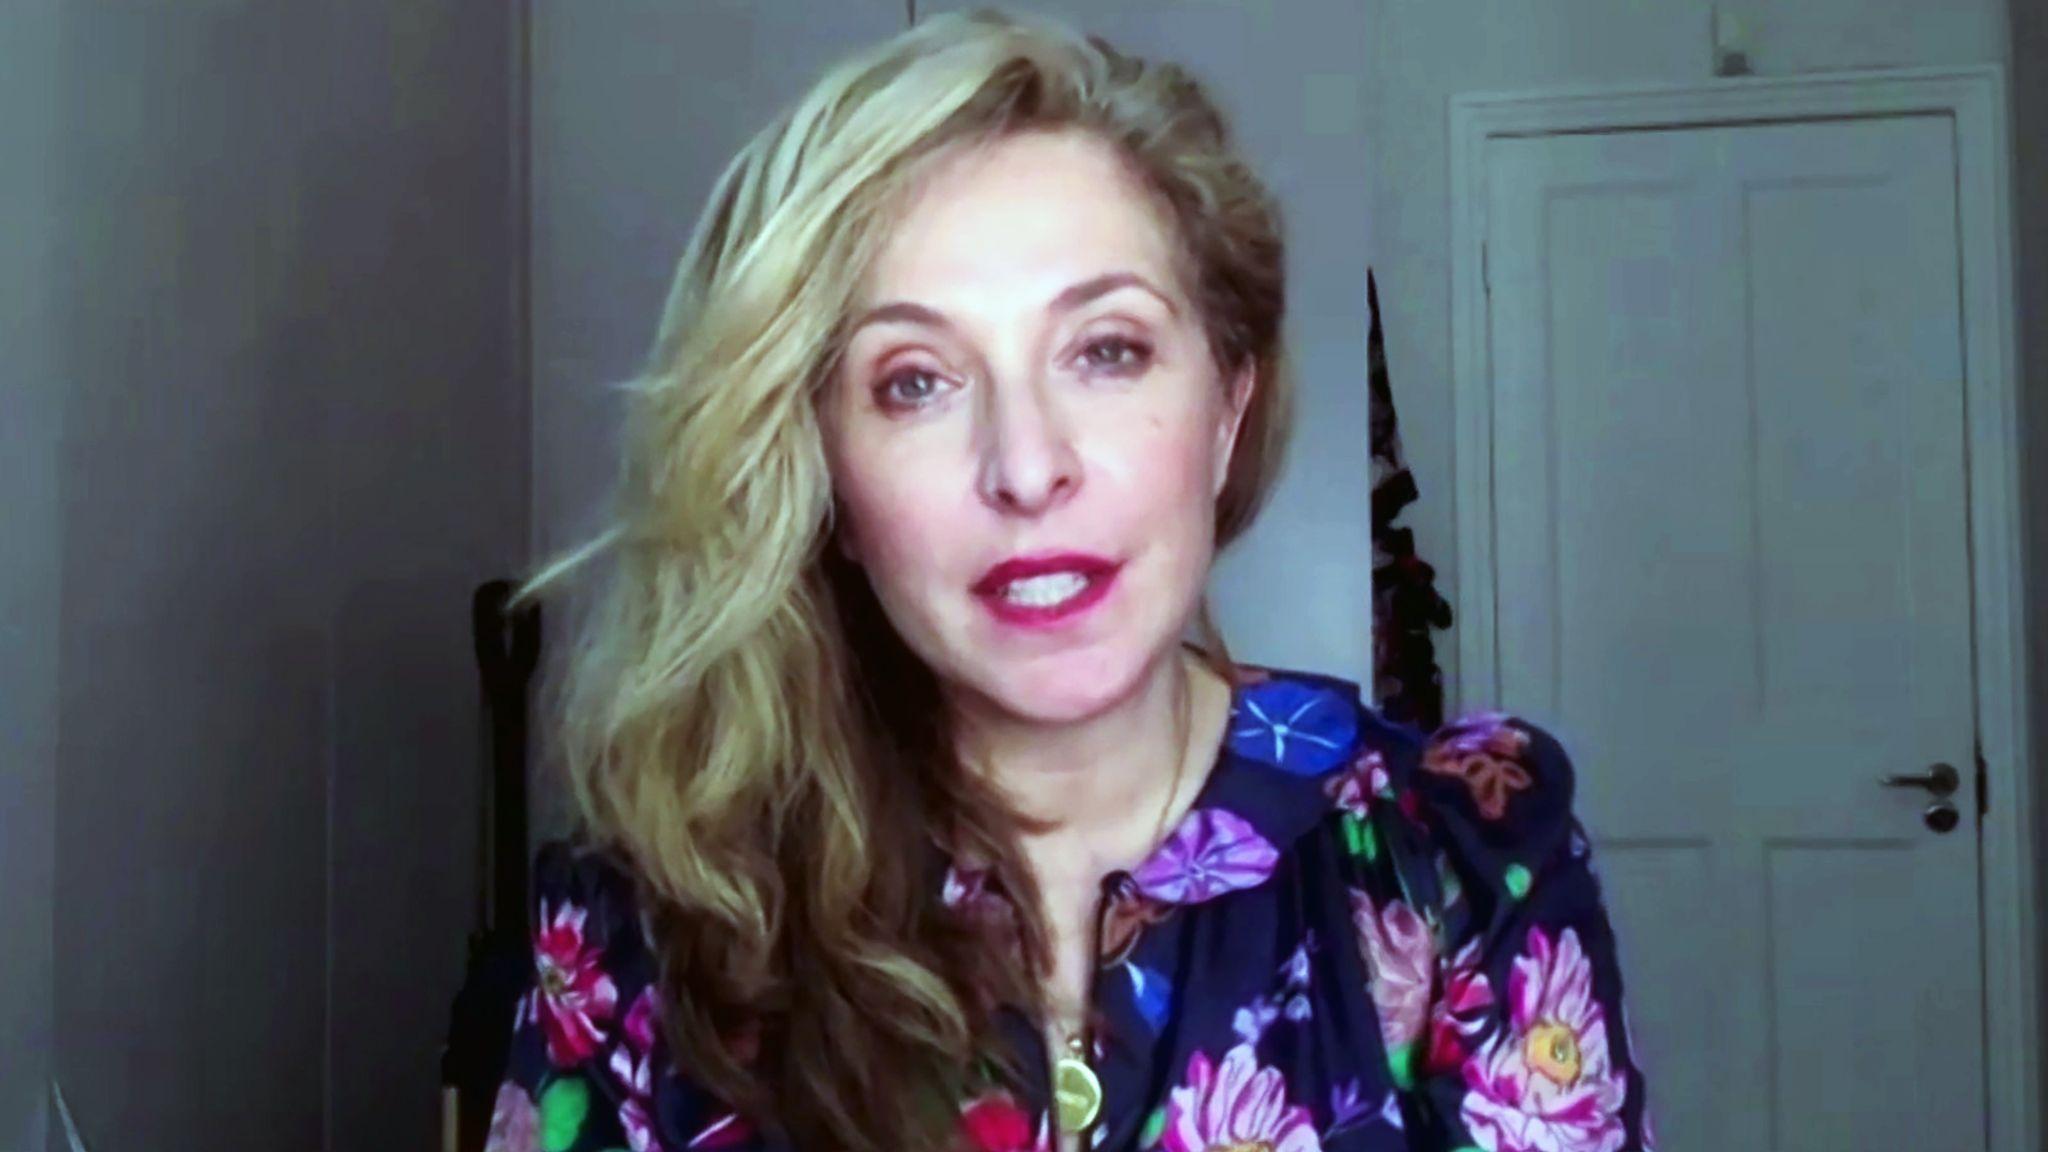 Actor Tracy-Ann Oberman